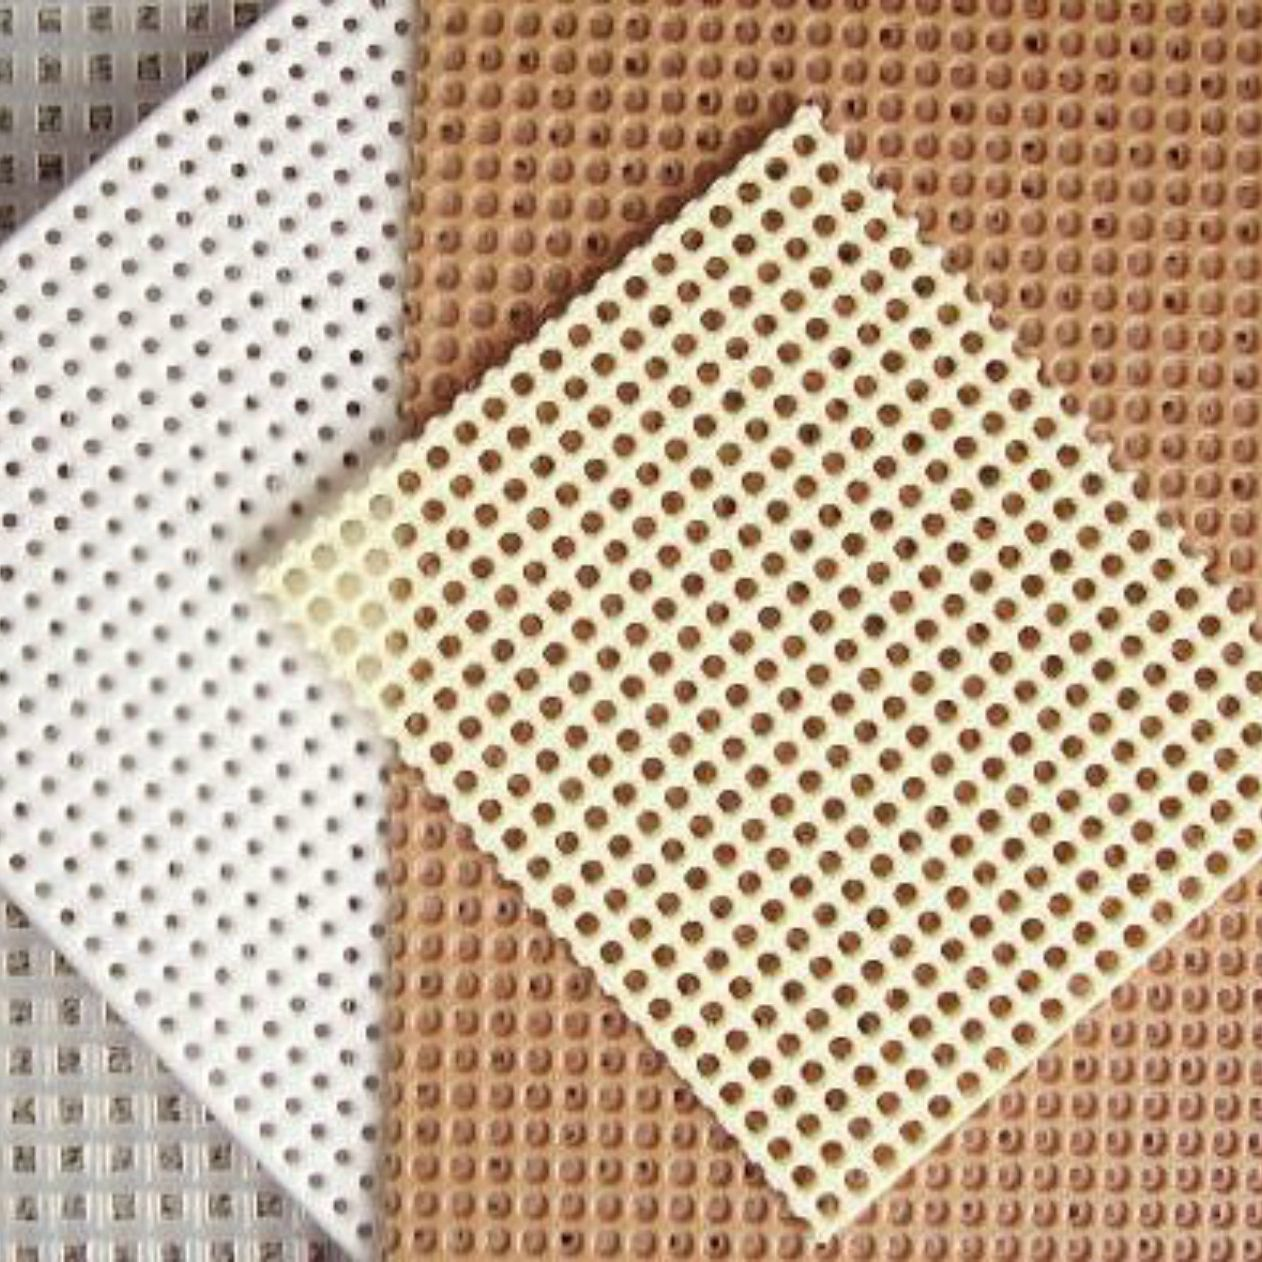 Cross Stitching On Plastic Canvas,Modern Interior Design For Medicine Retail Shop